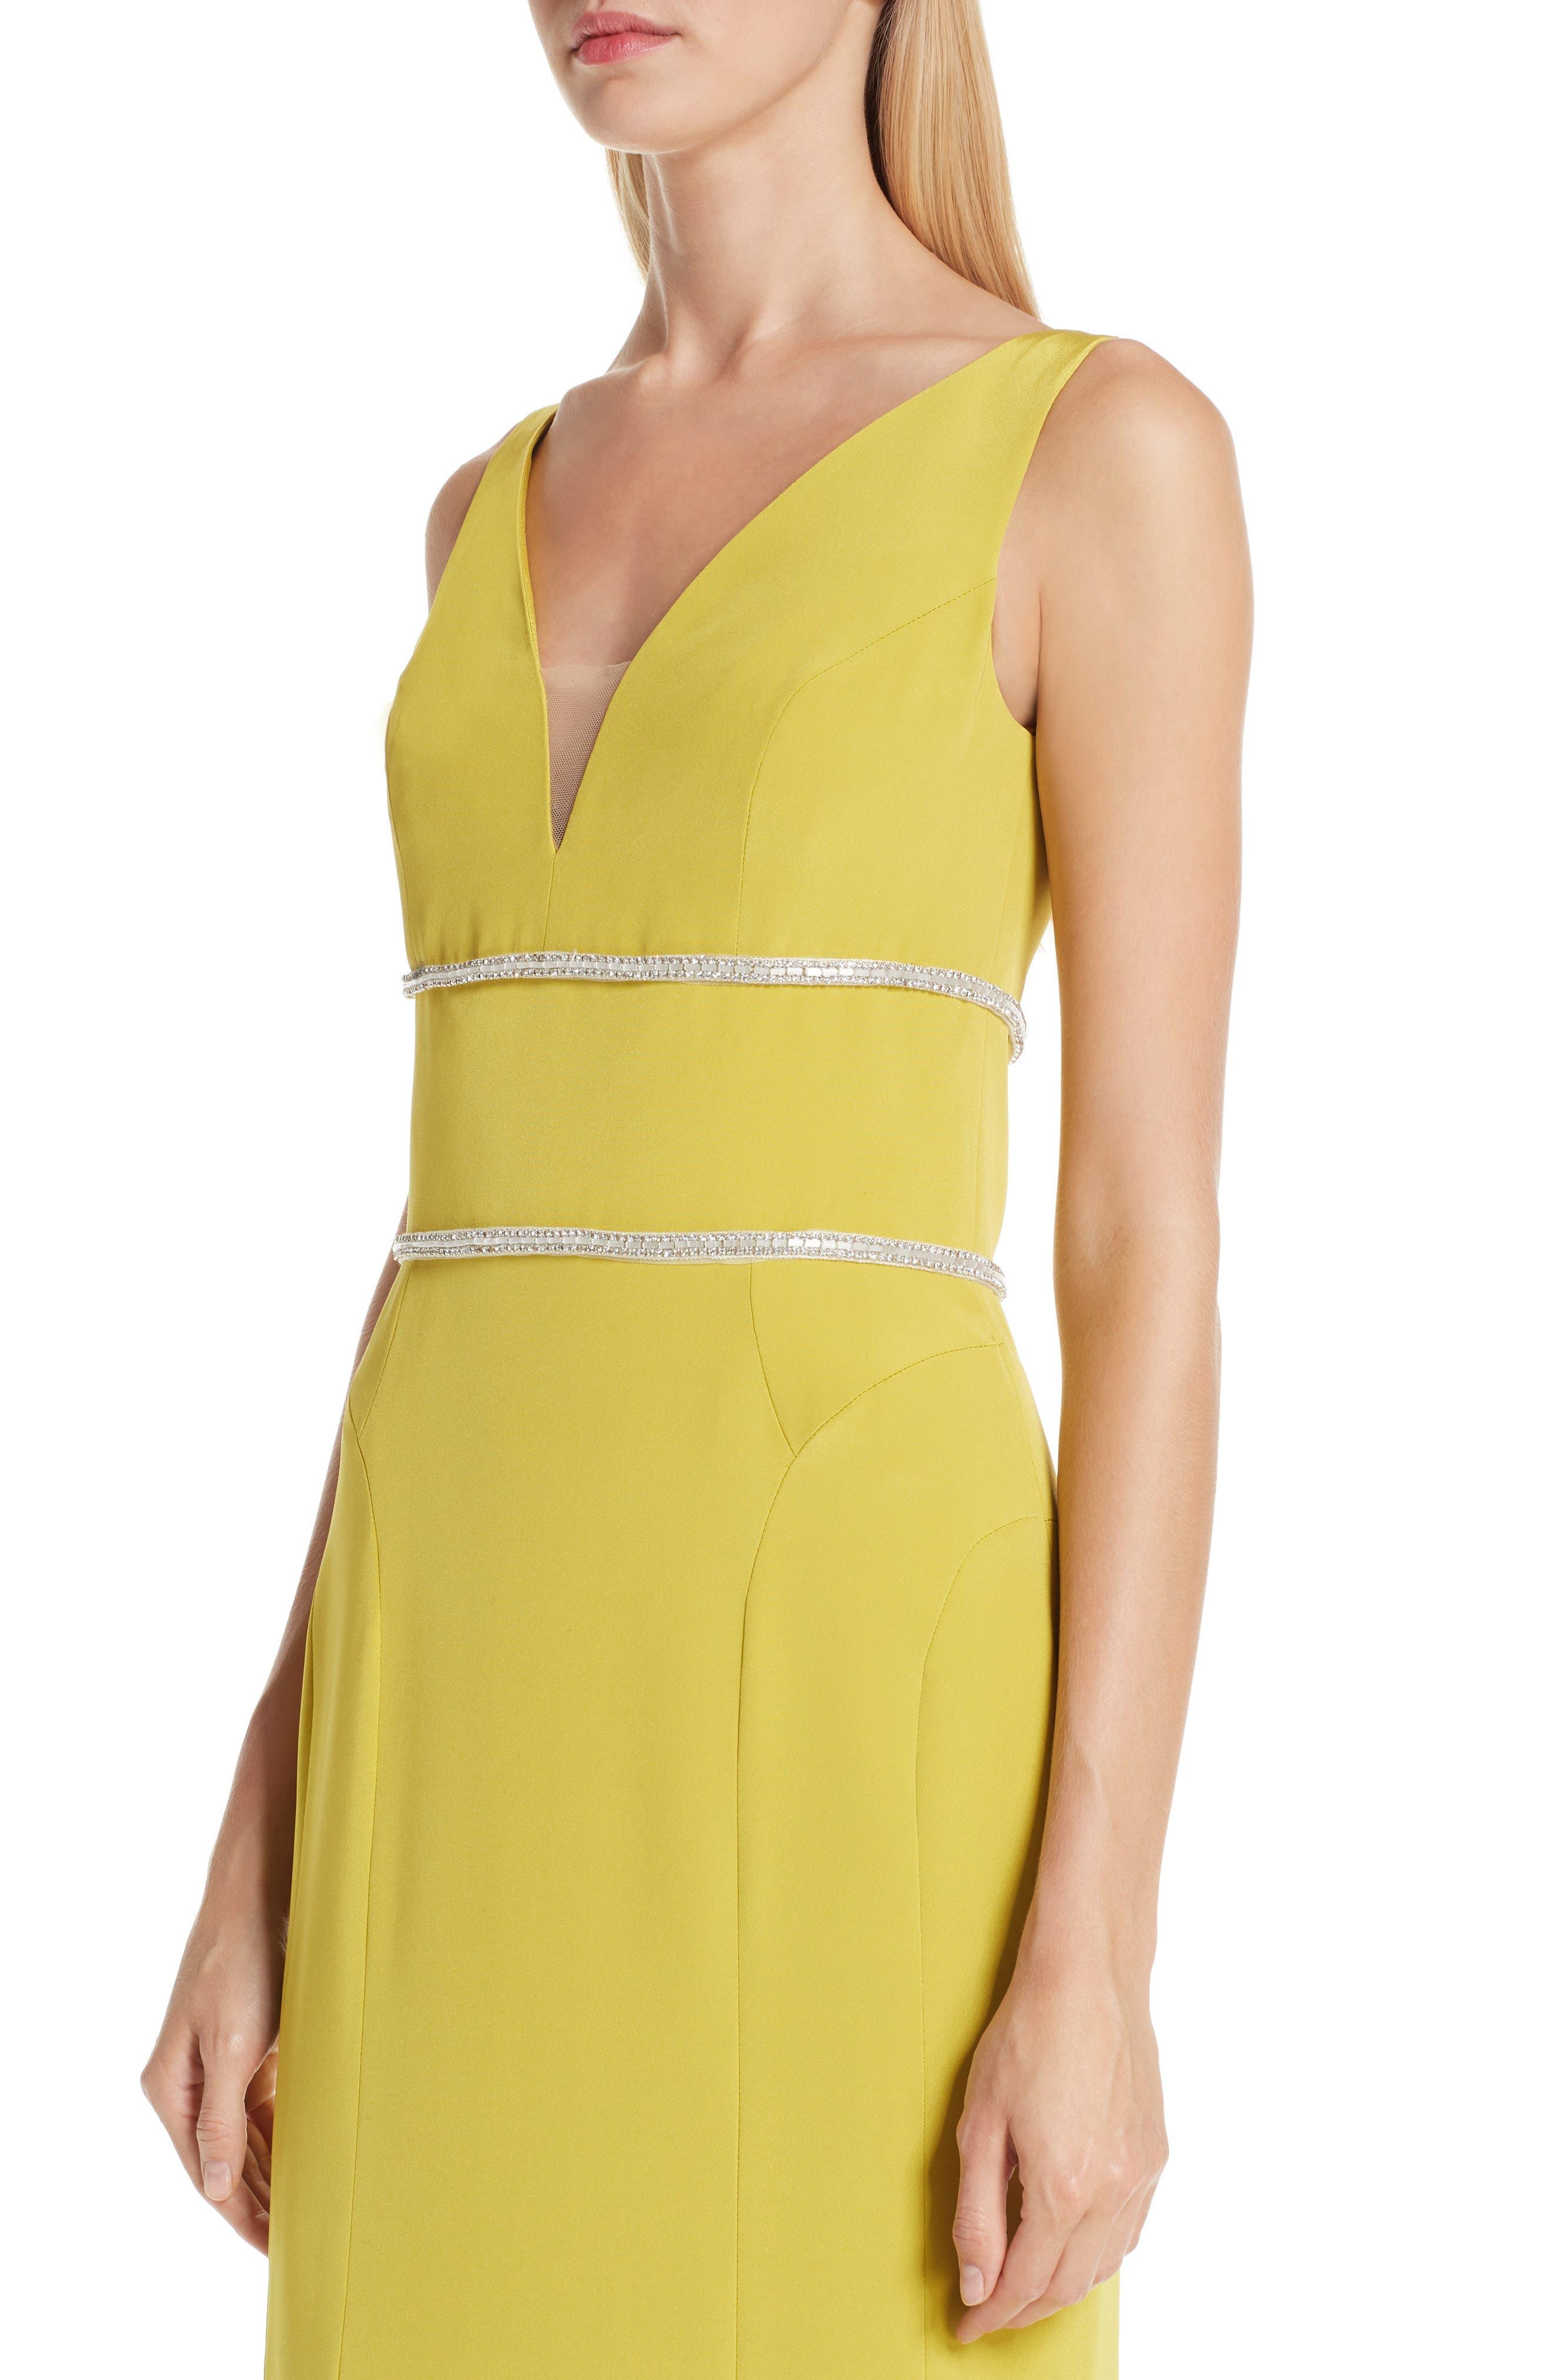 VERDIN,                             Embellished Silk V-Neck Evening Dress,                             Alternate thumbnail 4, color,                             CITRUS